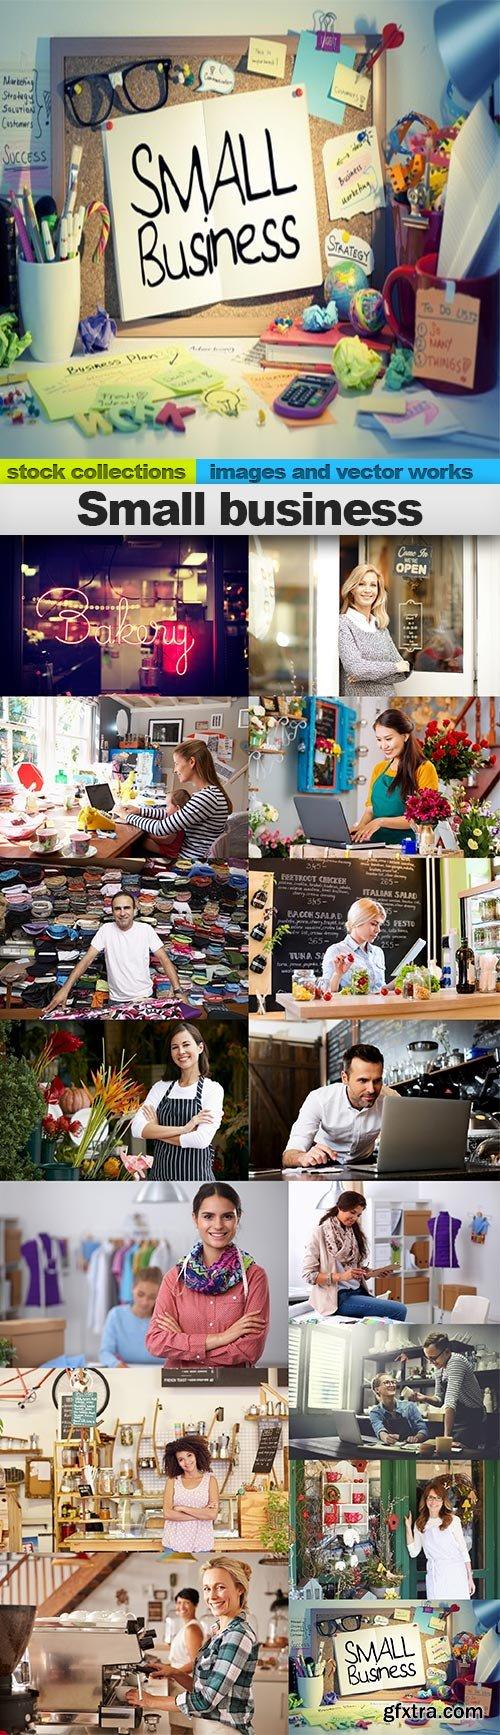 Small business, 15 x UHQ JPEG